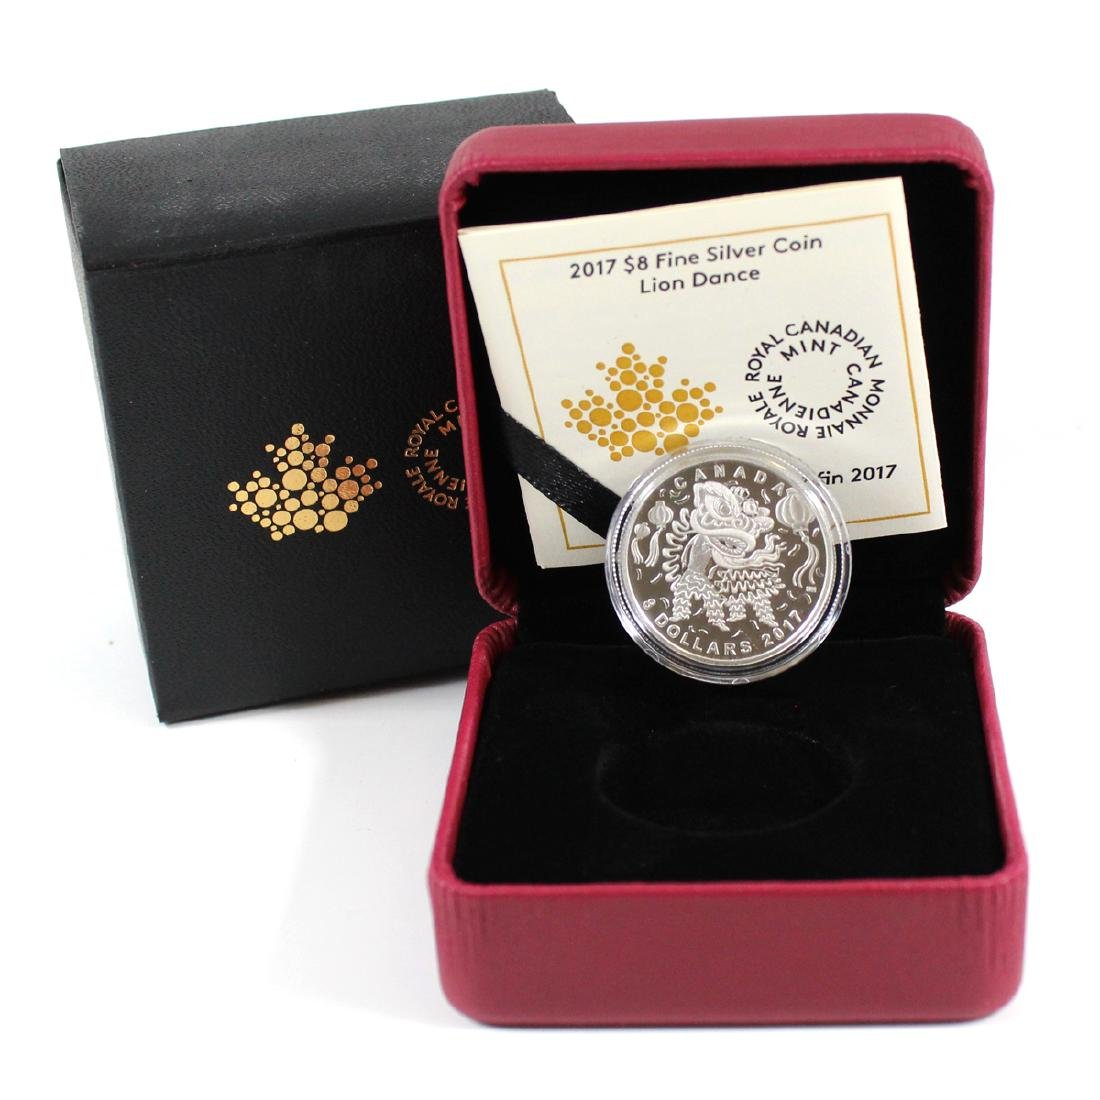 2017 Canada $8 Lion Dance Fine Silver Coin (TAX